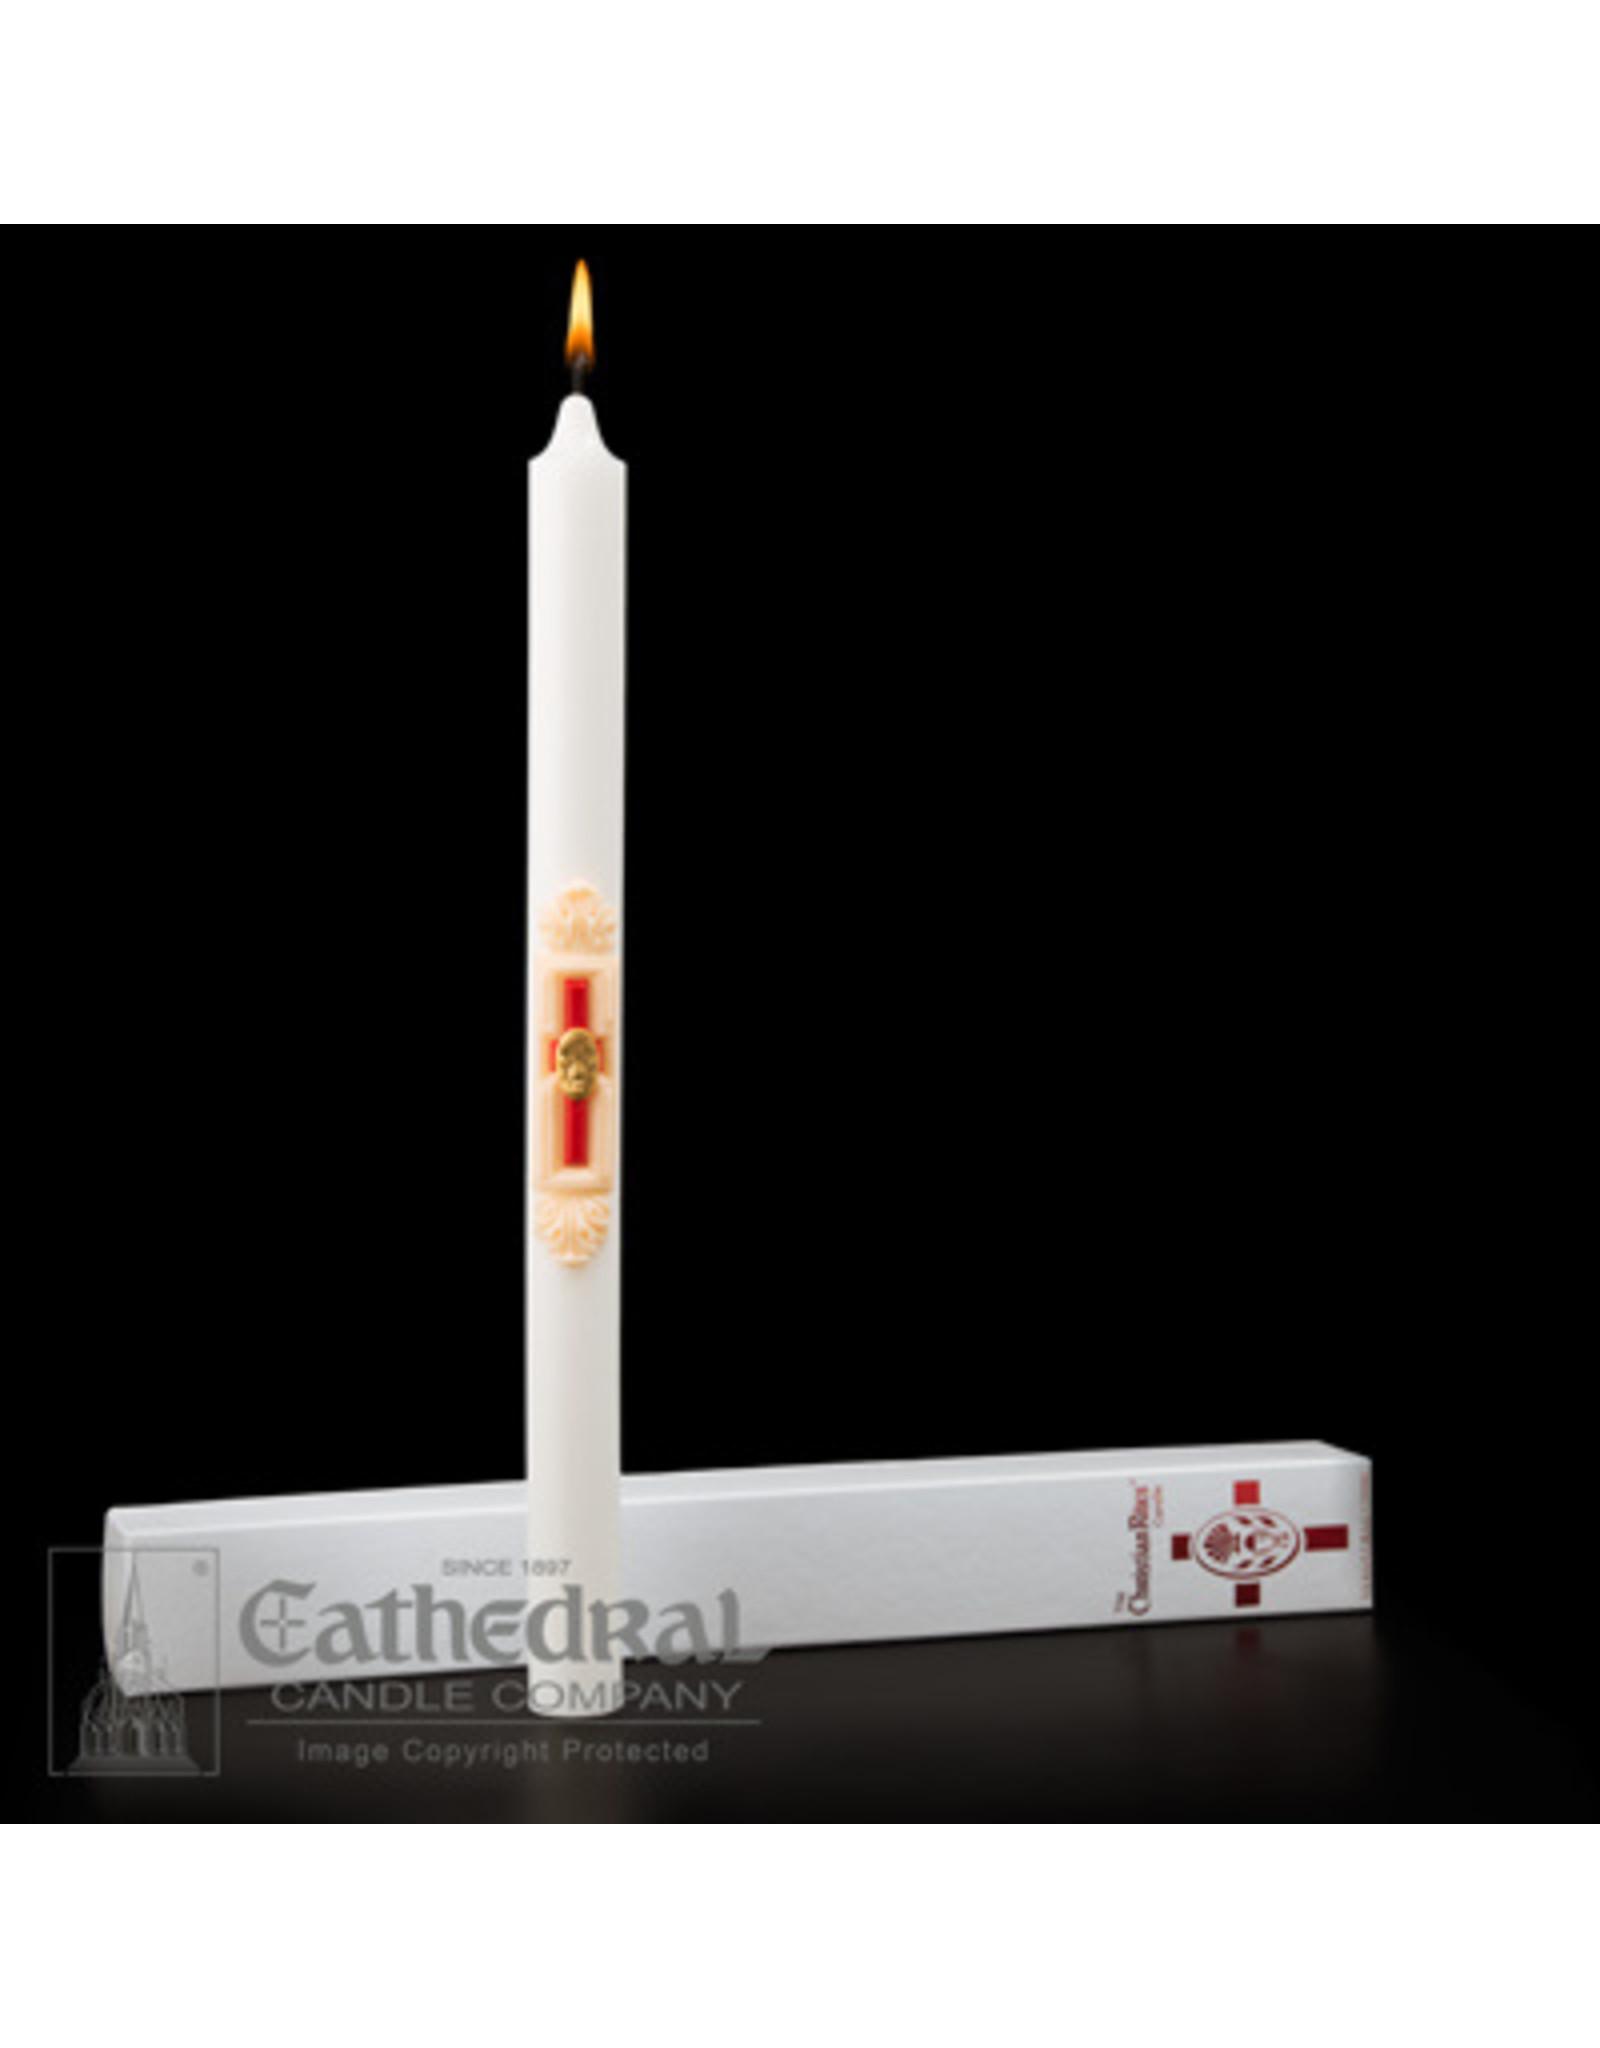 RCIA Christian Rites Candle 1.25x17